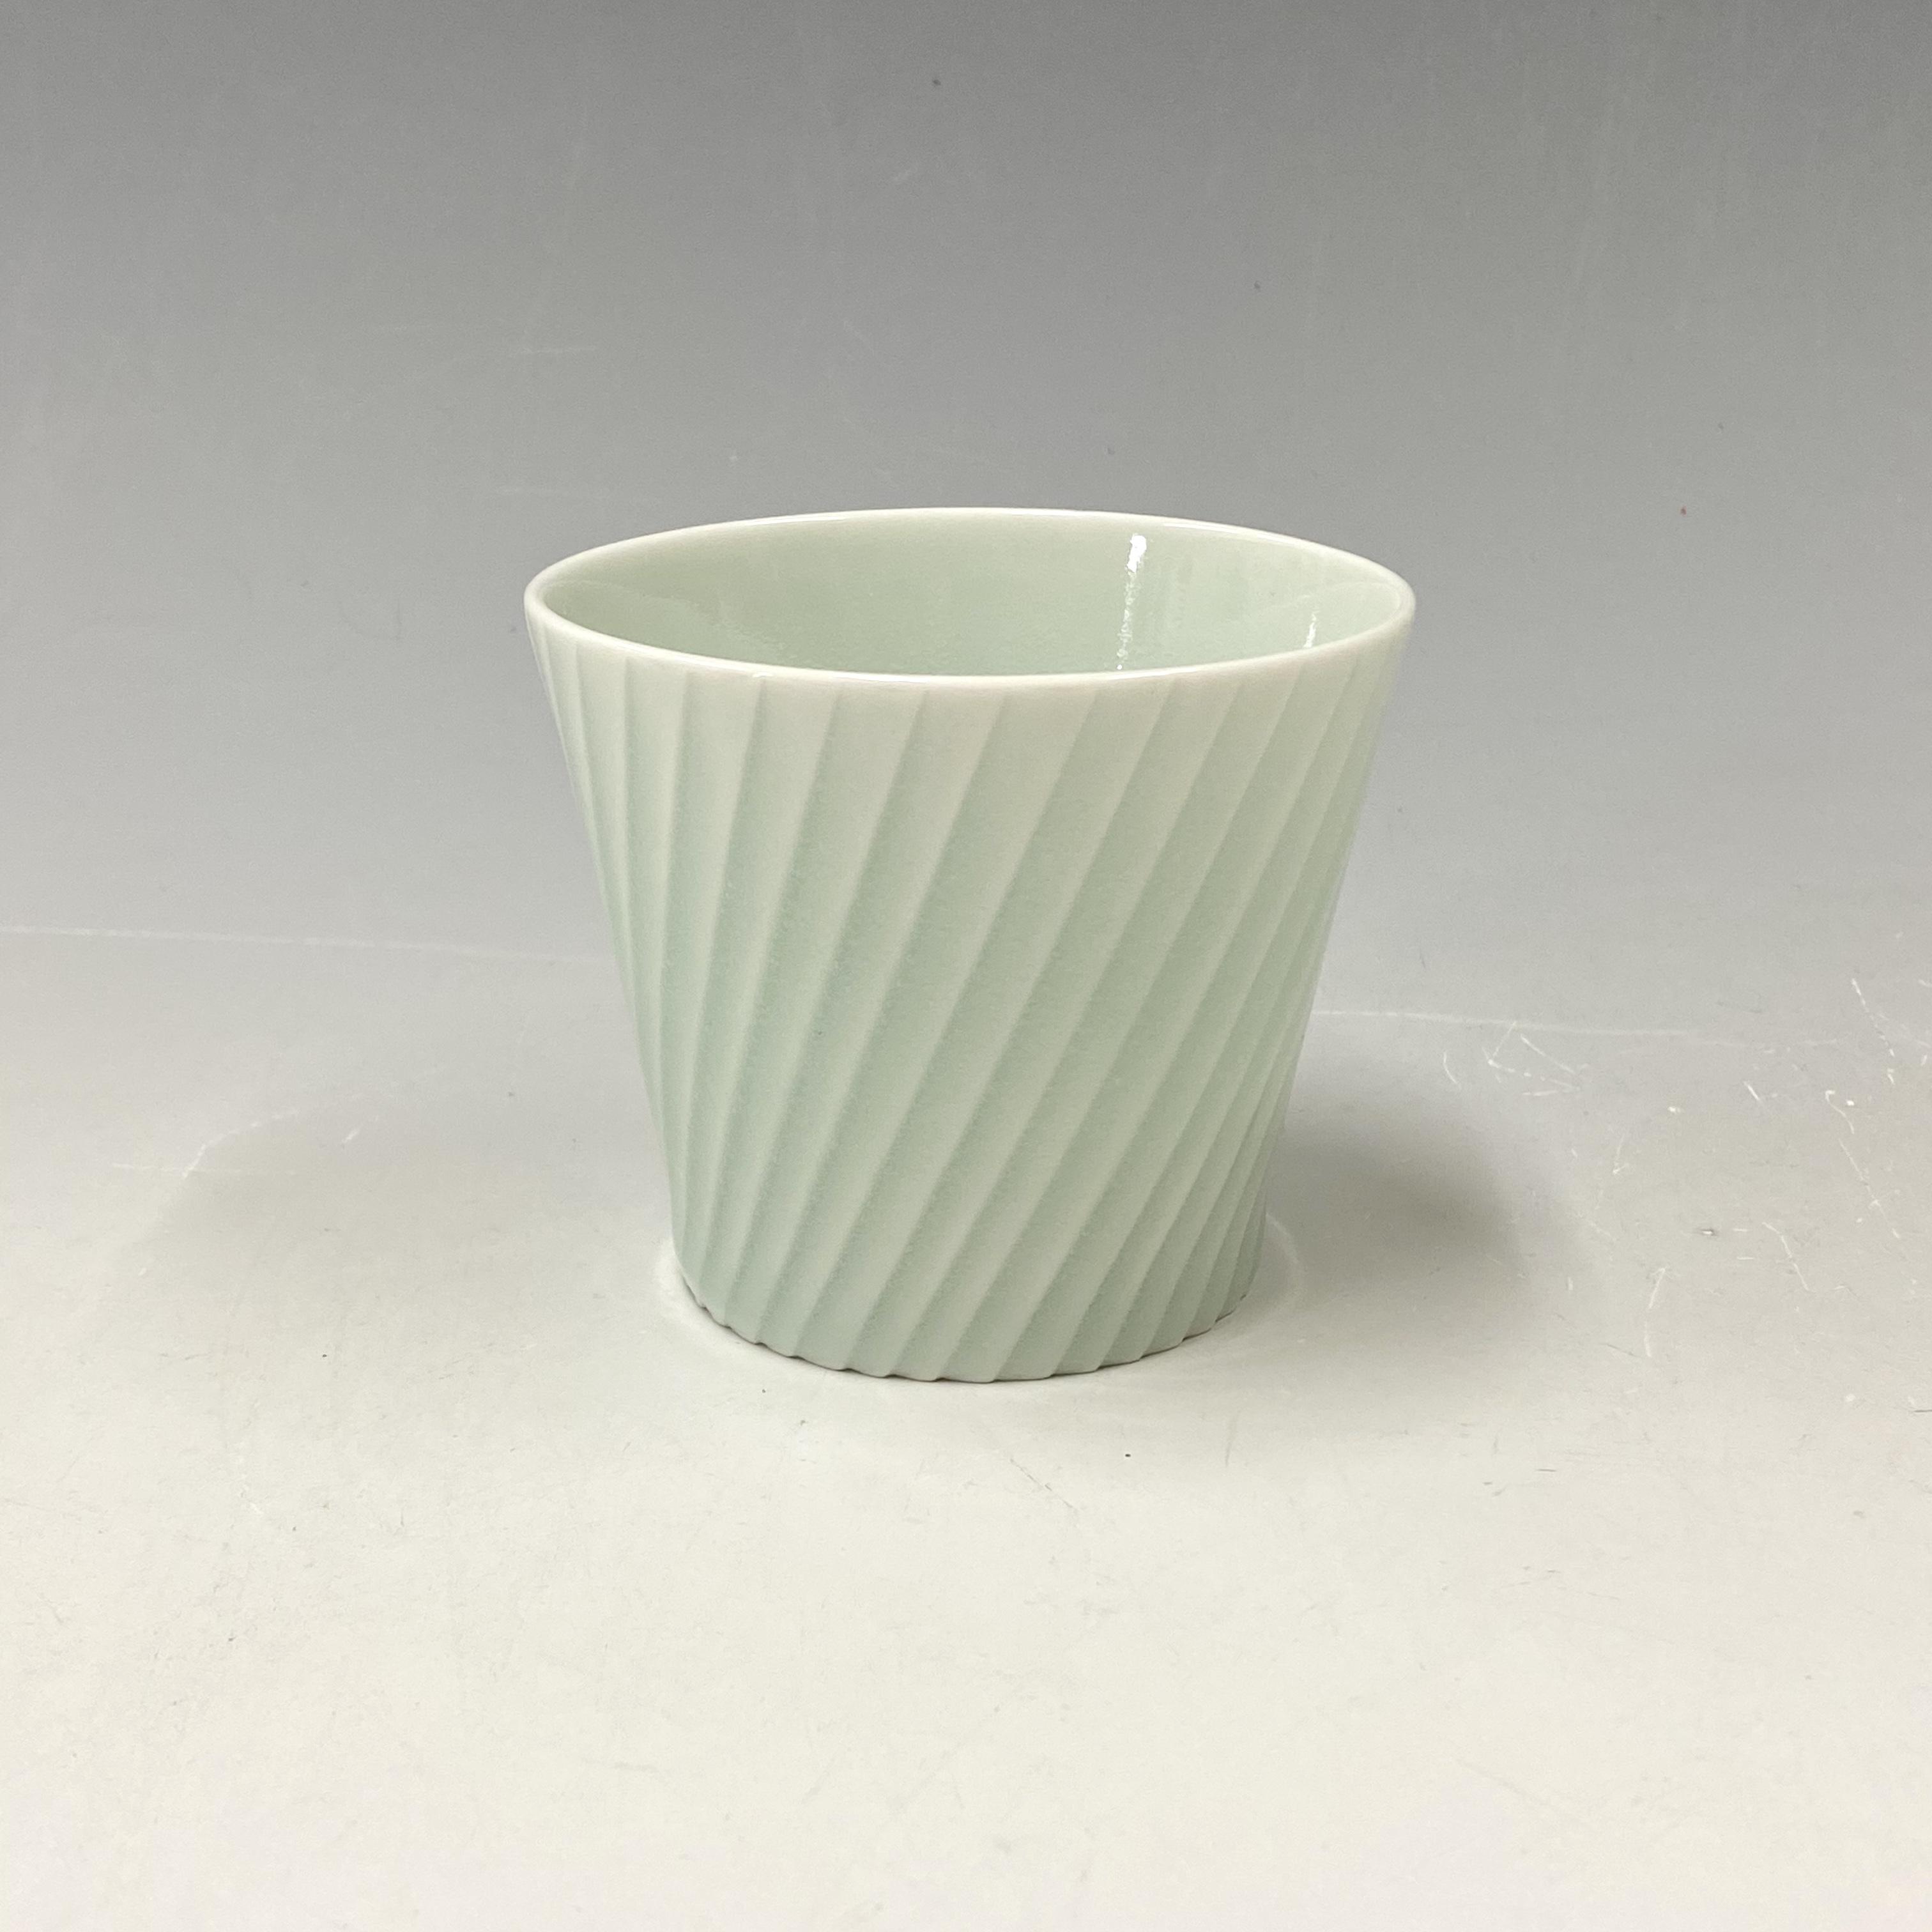 【中尾純】青白磁線彫蕎麦猪口(斜め)